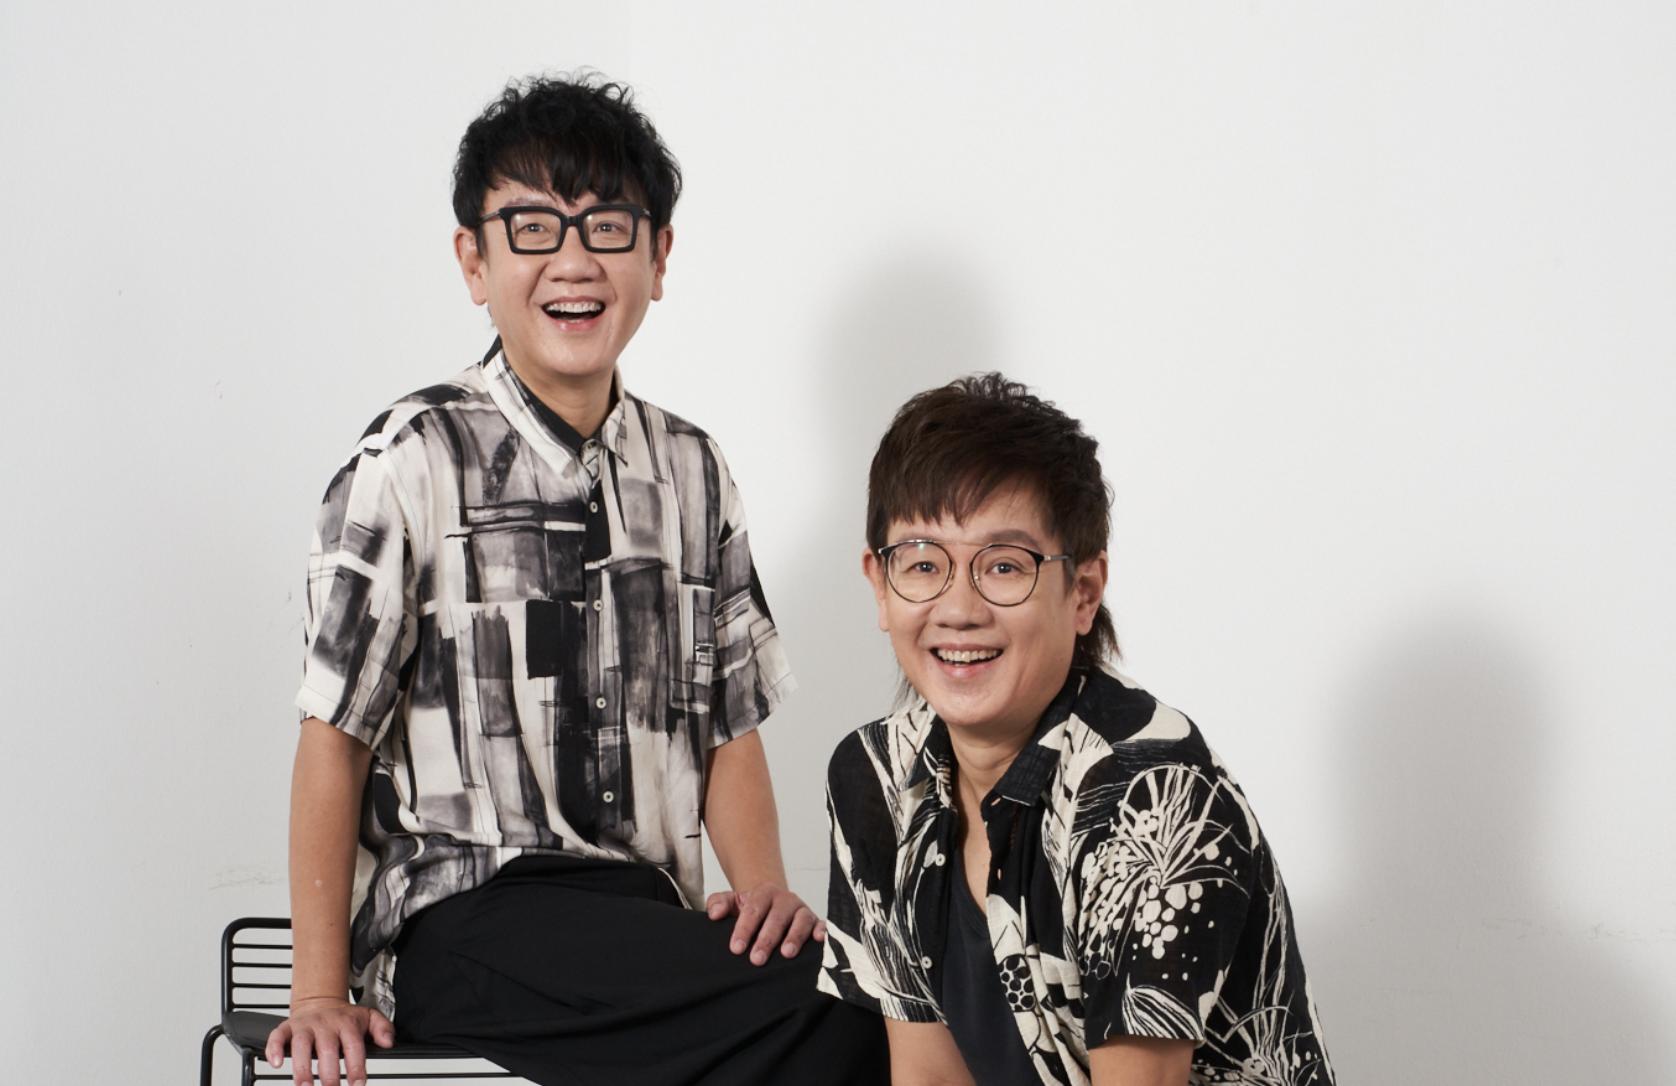 Meet the Singaporean Musician Twin Brothers Who Discovered Mandopop Singer Stefanie Sun